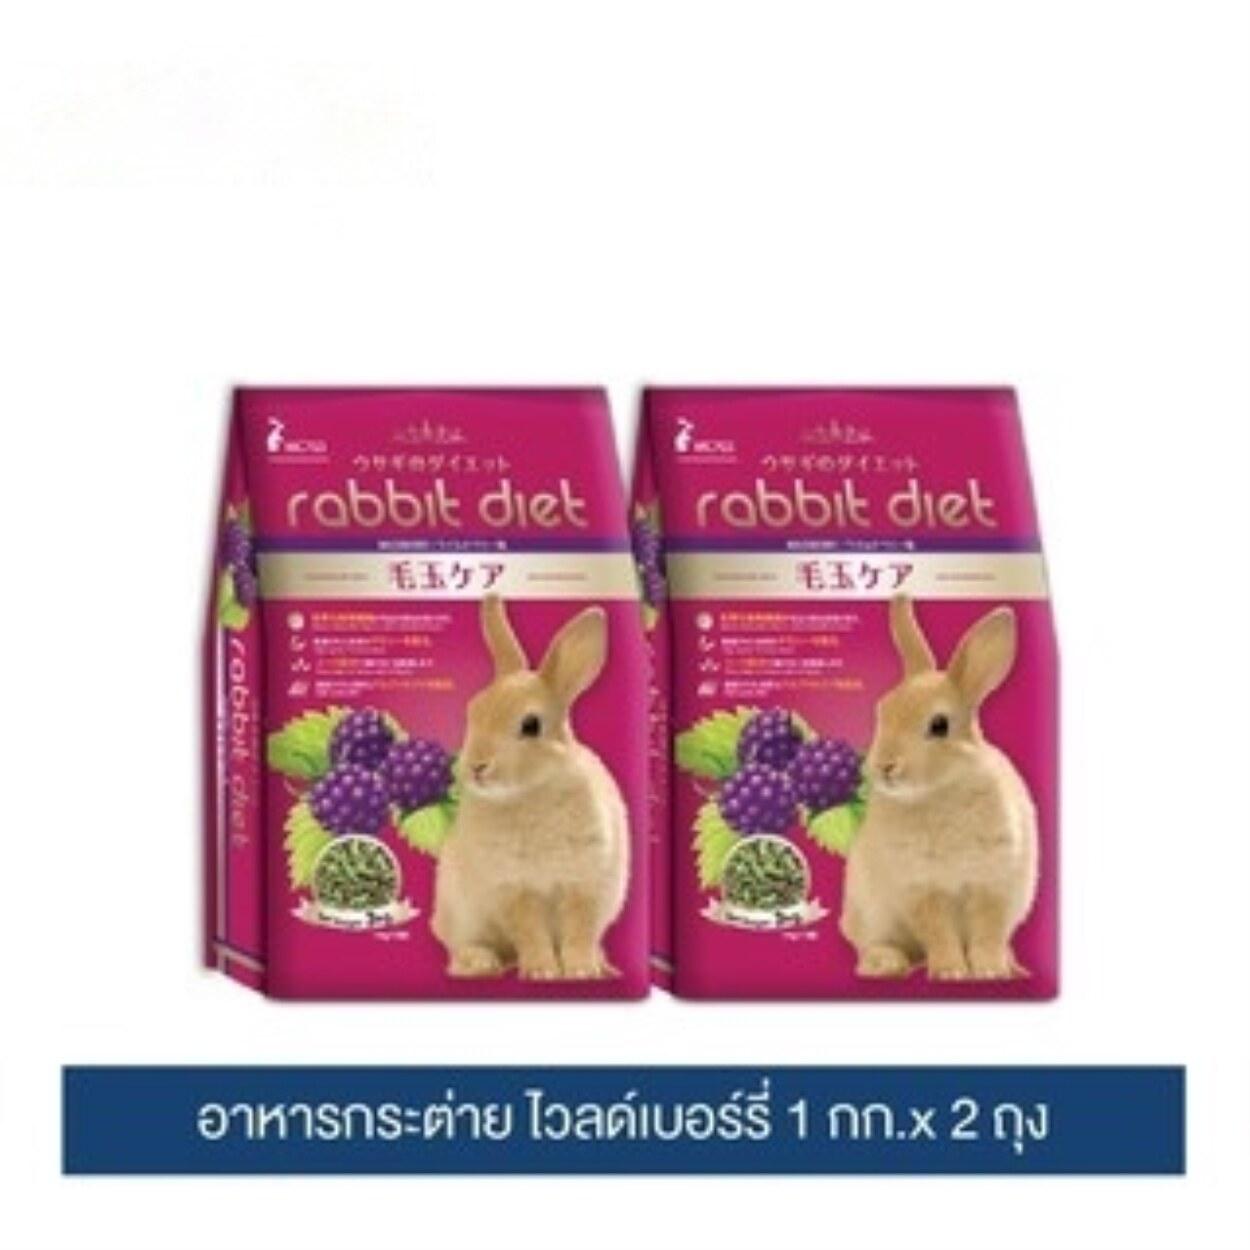 vitakraft แรบบิท ไดเอ็ท อาหารกระต่าย (ไวลด์เบอร์รี่) 1กก. x 2 ถุง / Rabbit Diet (Wildberry) 1kg. x 2 Packs